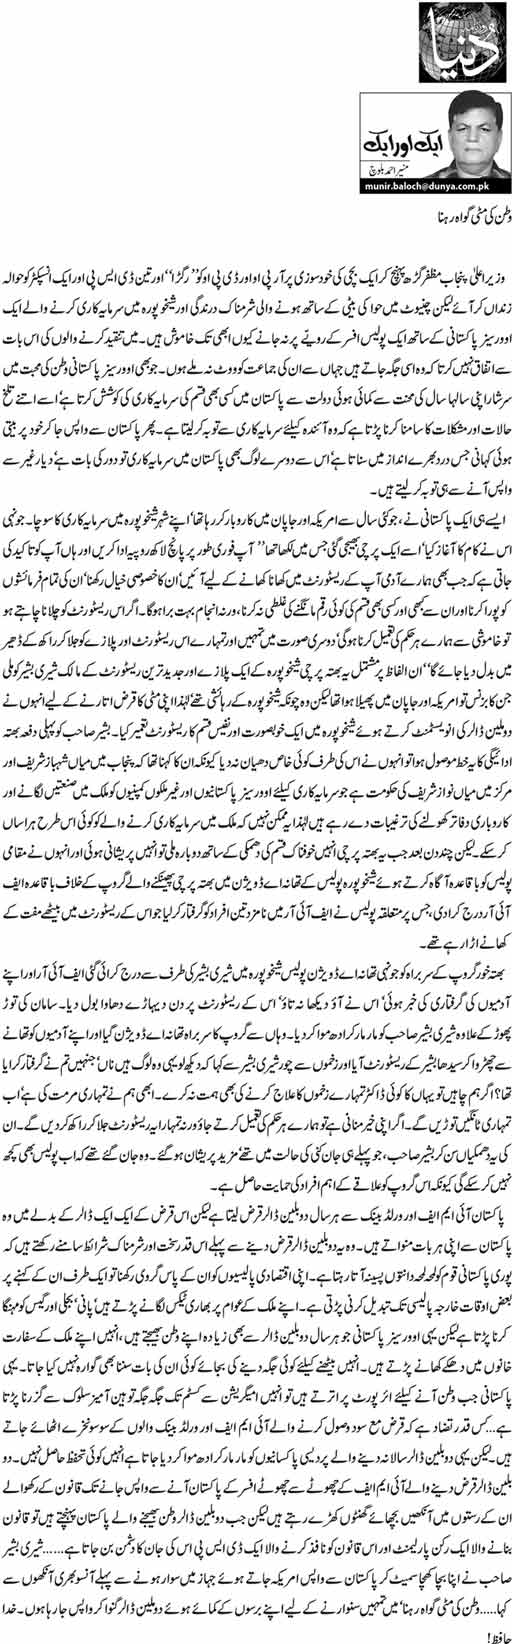 Watan Ki Matti Gawah Rehna - Munir Ahmed Baloch